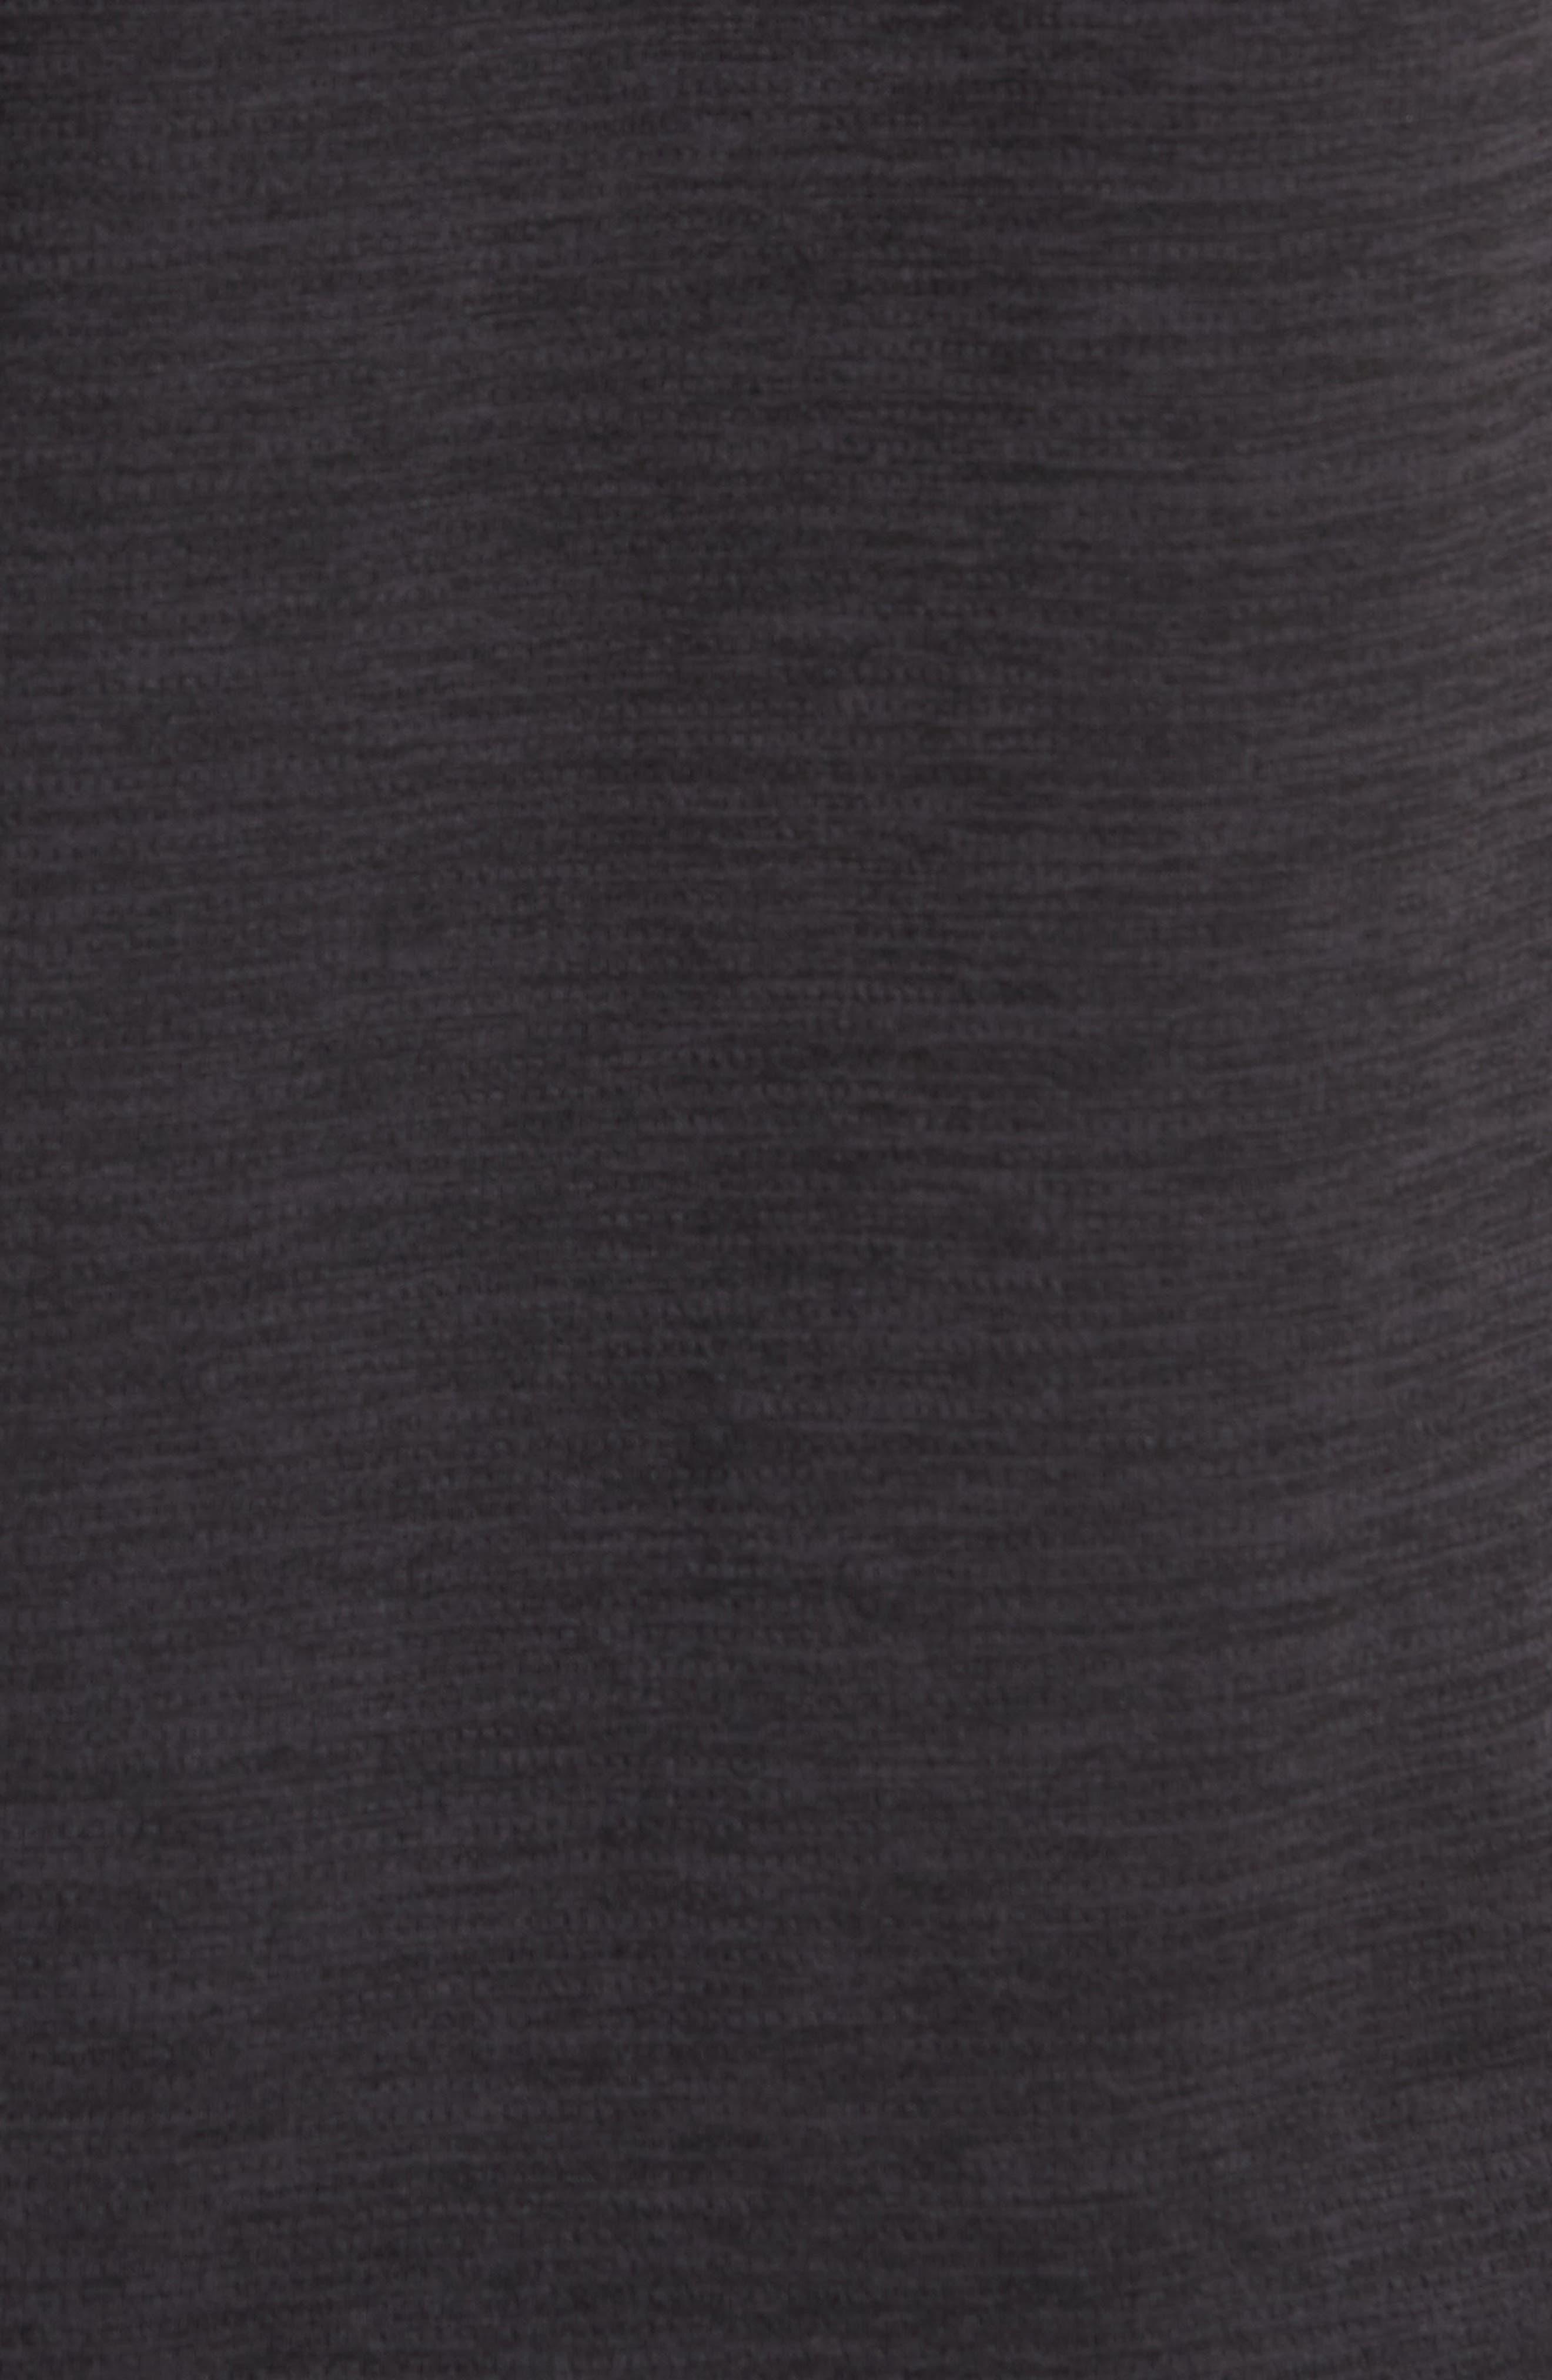 ZELLA, Kinoite Raglan Crewneck T-Shirt, Alternate thumbnail 6, color, BLACK OXIDE MELANGE